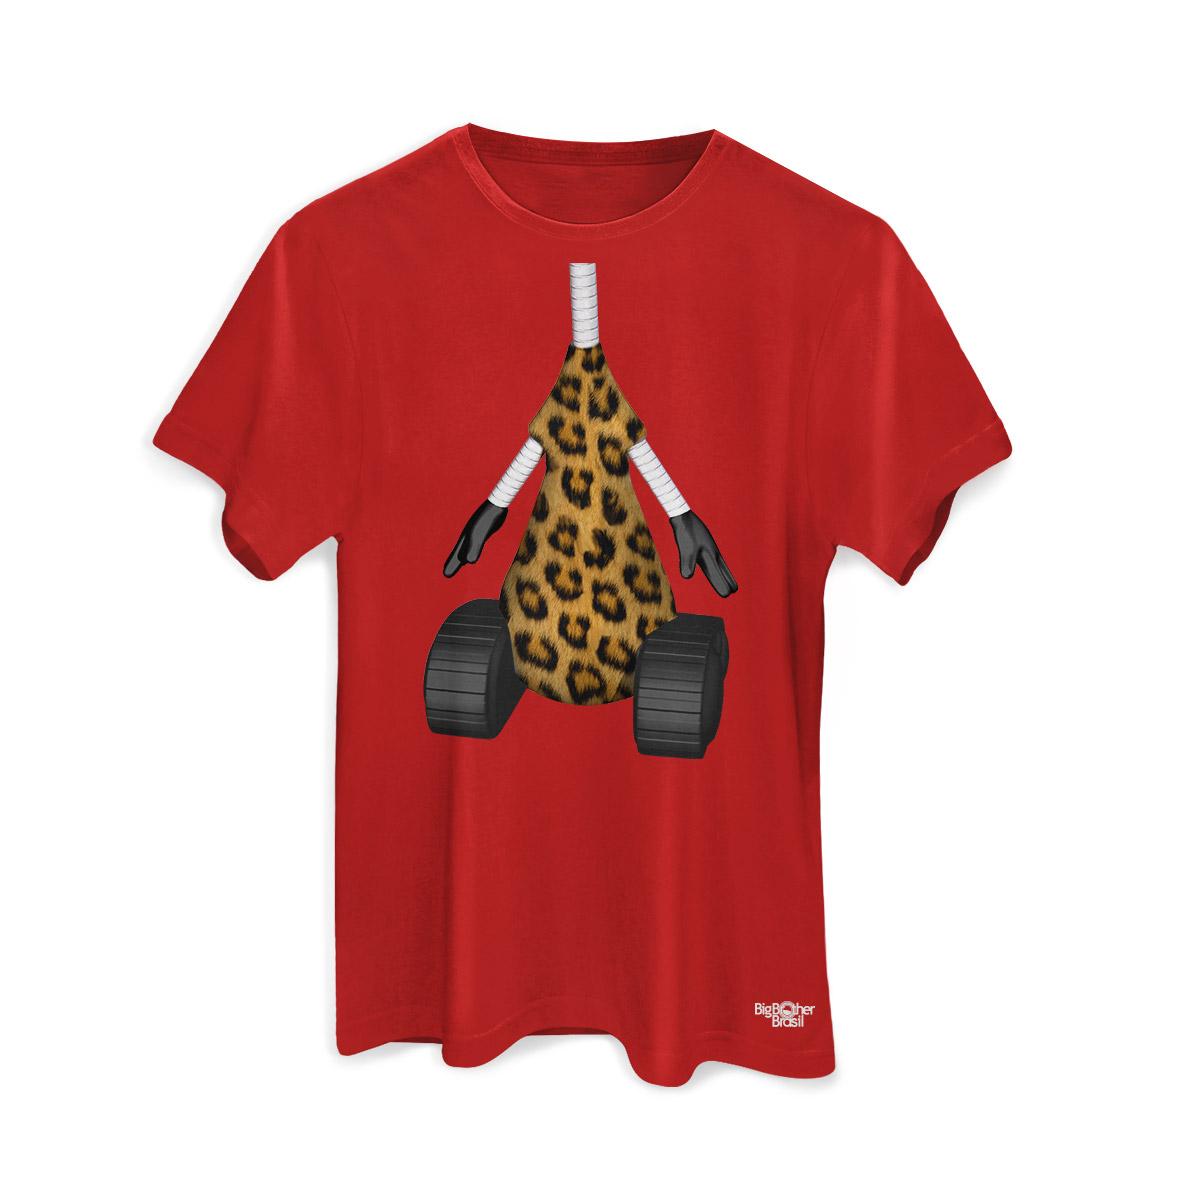 Camiseta Masculina Big Brother Brasil 15 RoBBB Oncinha